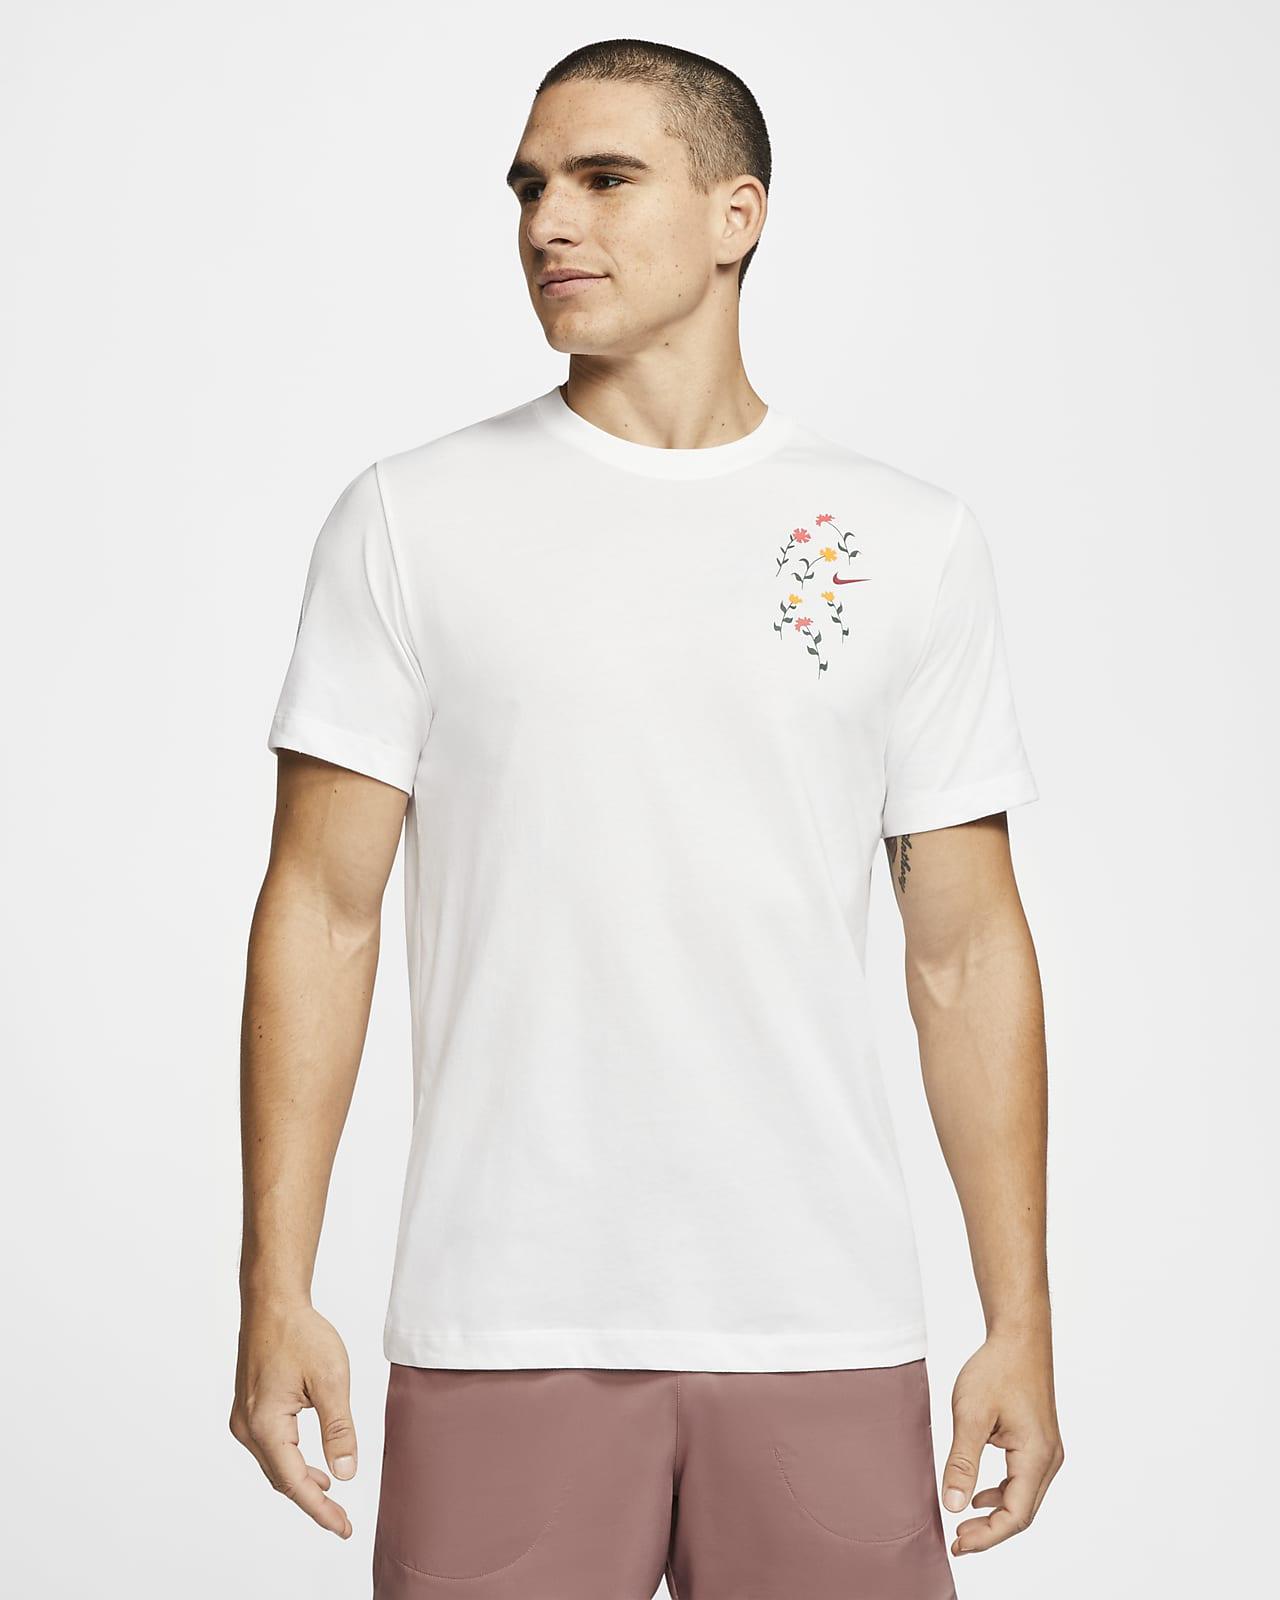 Nike Dri-FIT A.I.R. Herren-T-Shirt